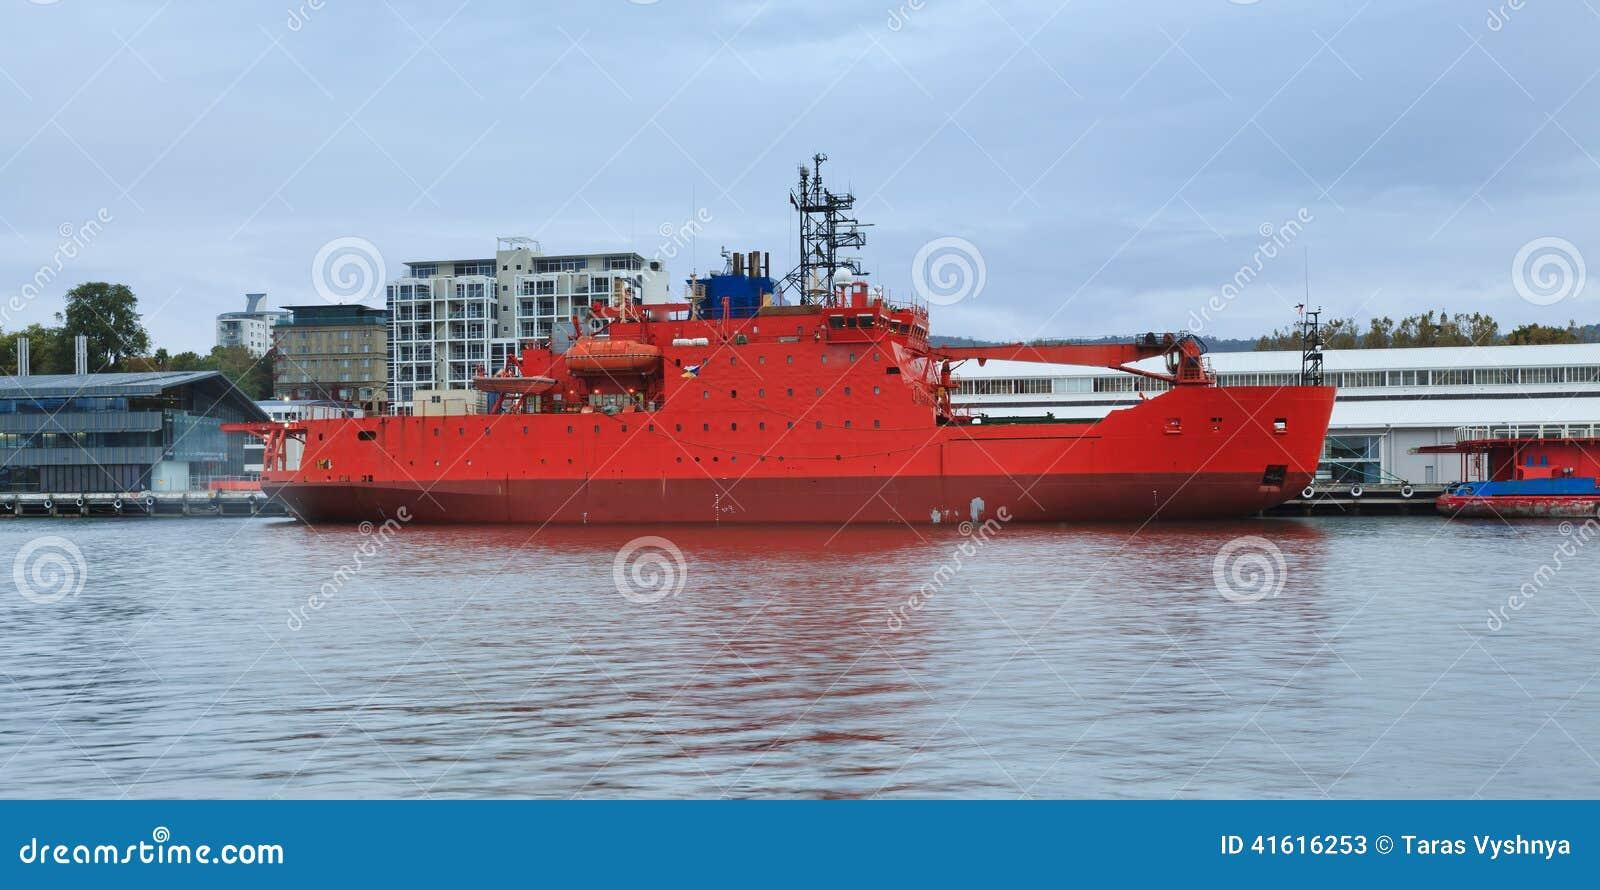 Icebreaker Red Hobart stock image  Image of commercial